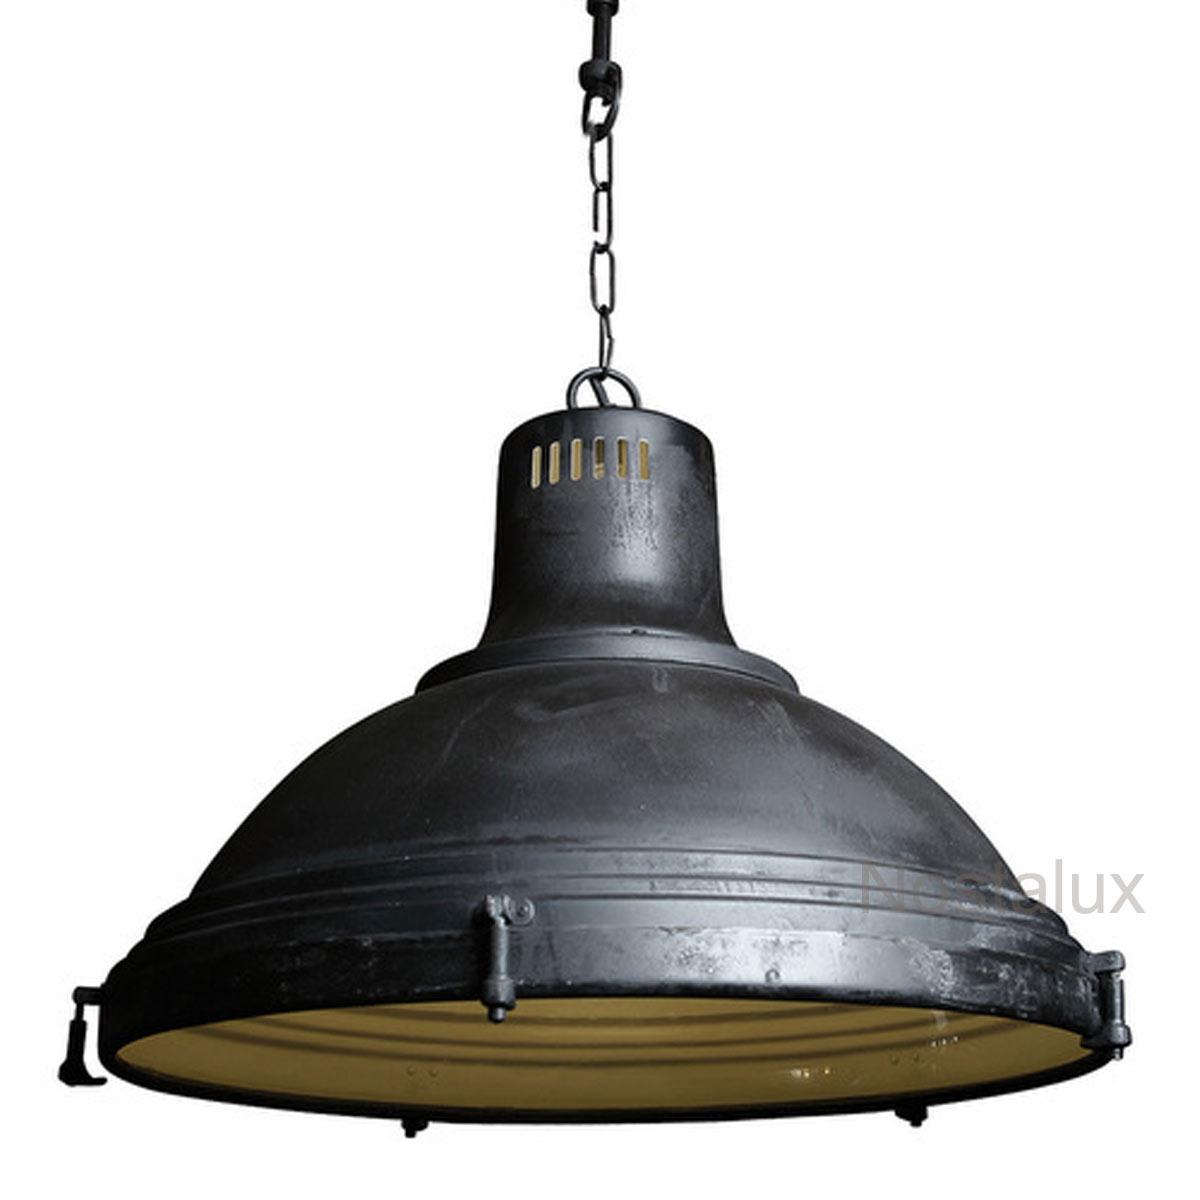 30180-industriele-lamp-agra-zwart-01-1200x1200